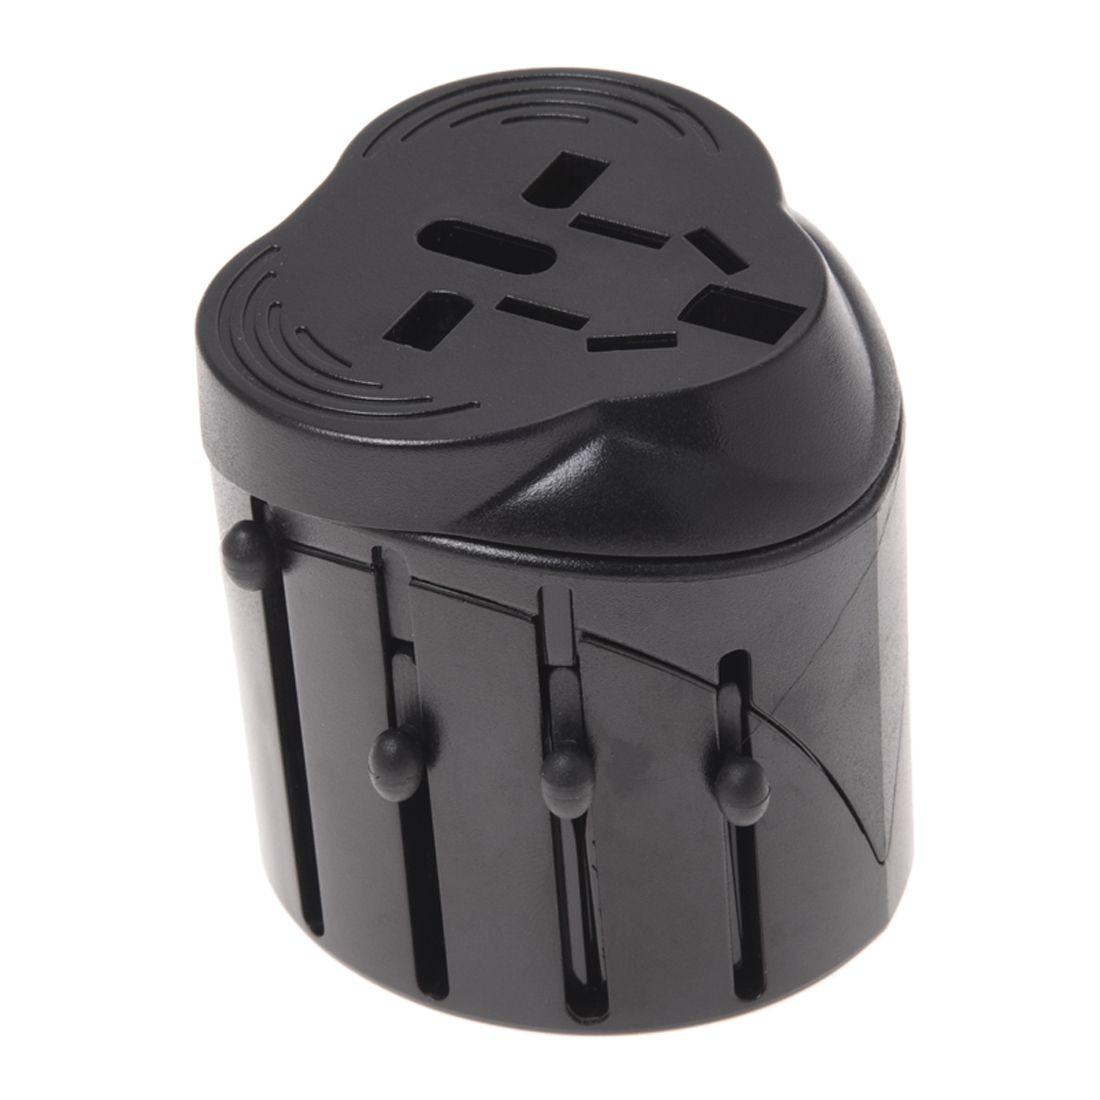 Universal Travel Dual USB Power Supply Plug Adapter Charger US/EU/UK/AU